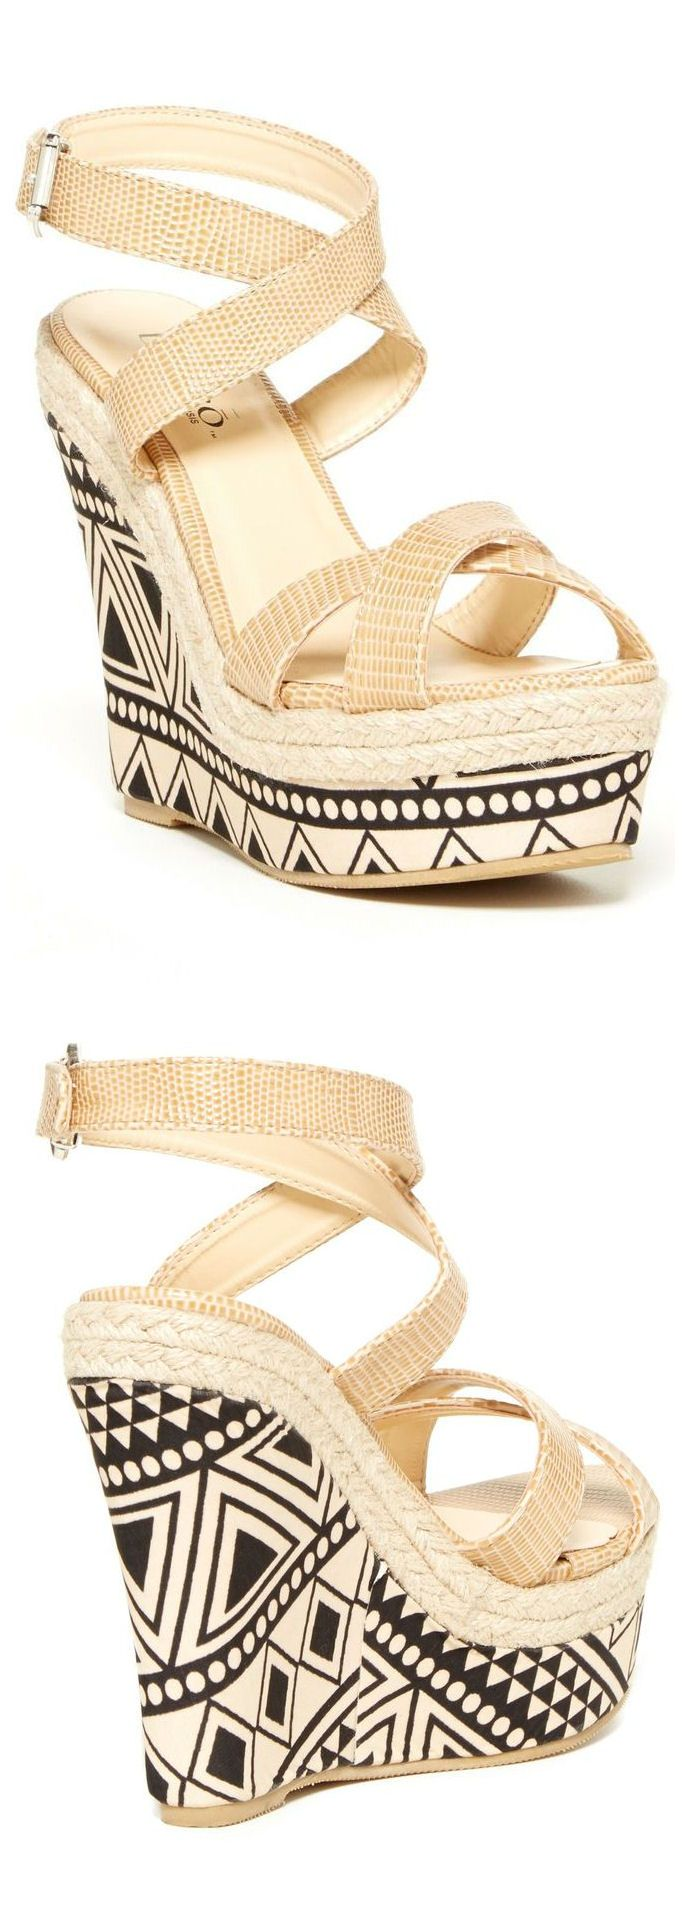 Tribal Wedge Sandals ♥